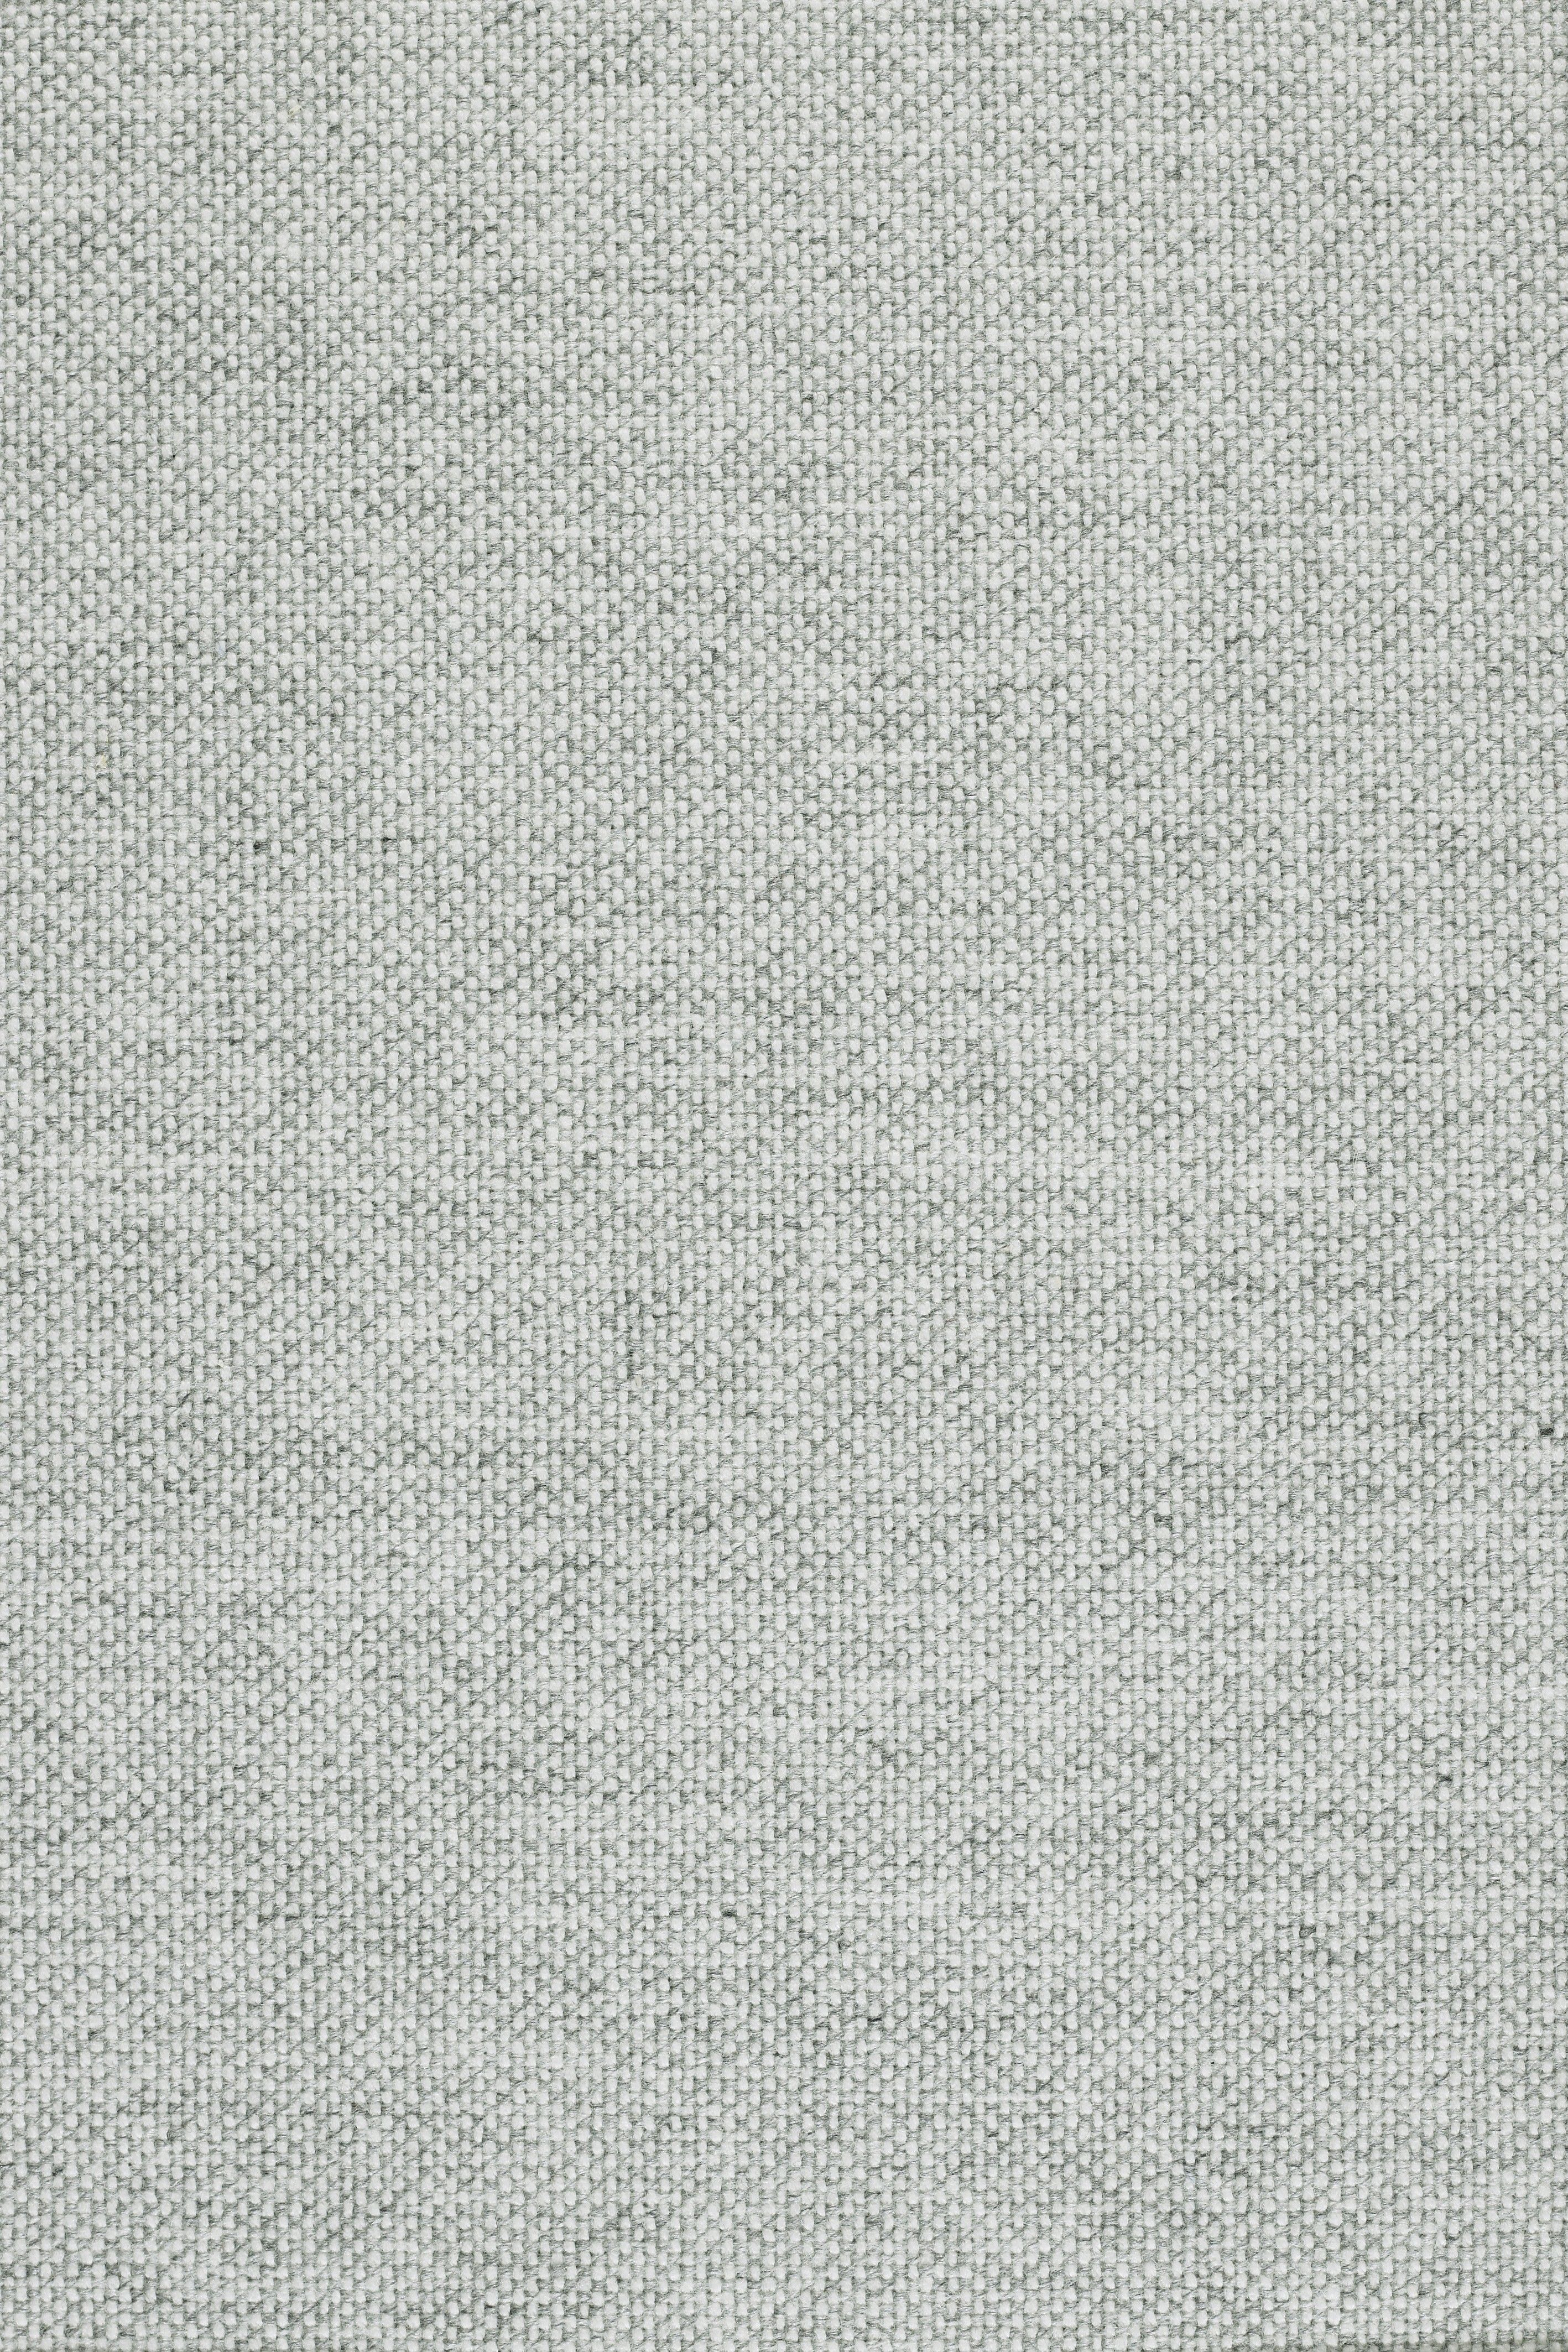 Hallingdal 65 Kvadrat White Fabric Texture Textured Artwork Textile Texture